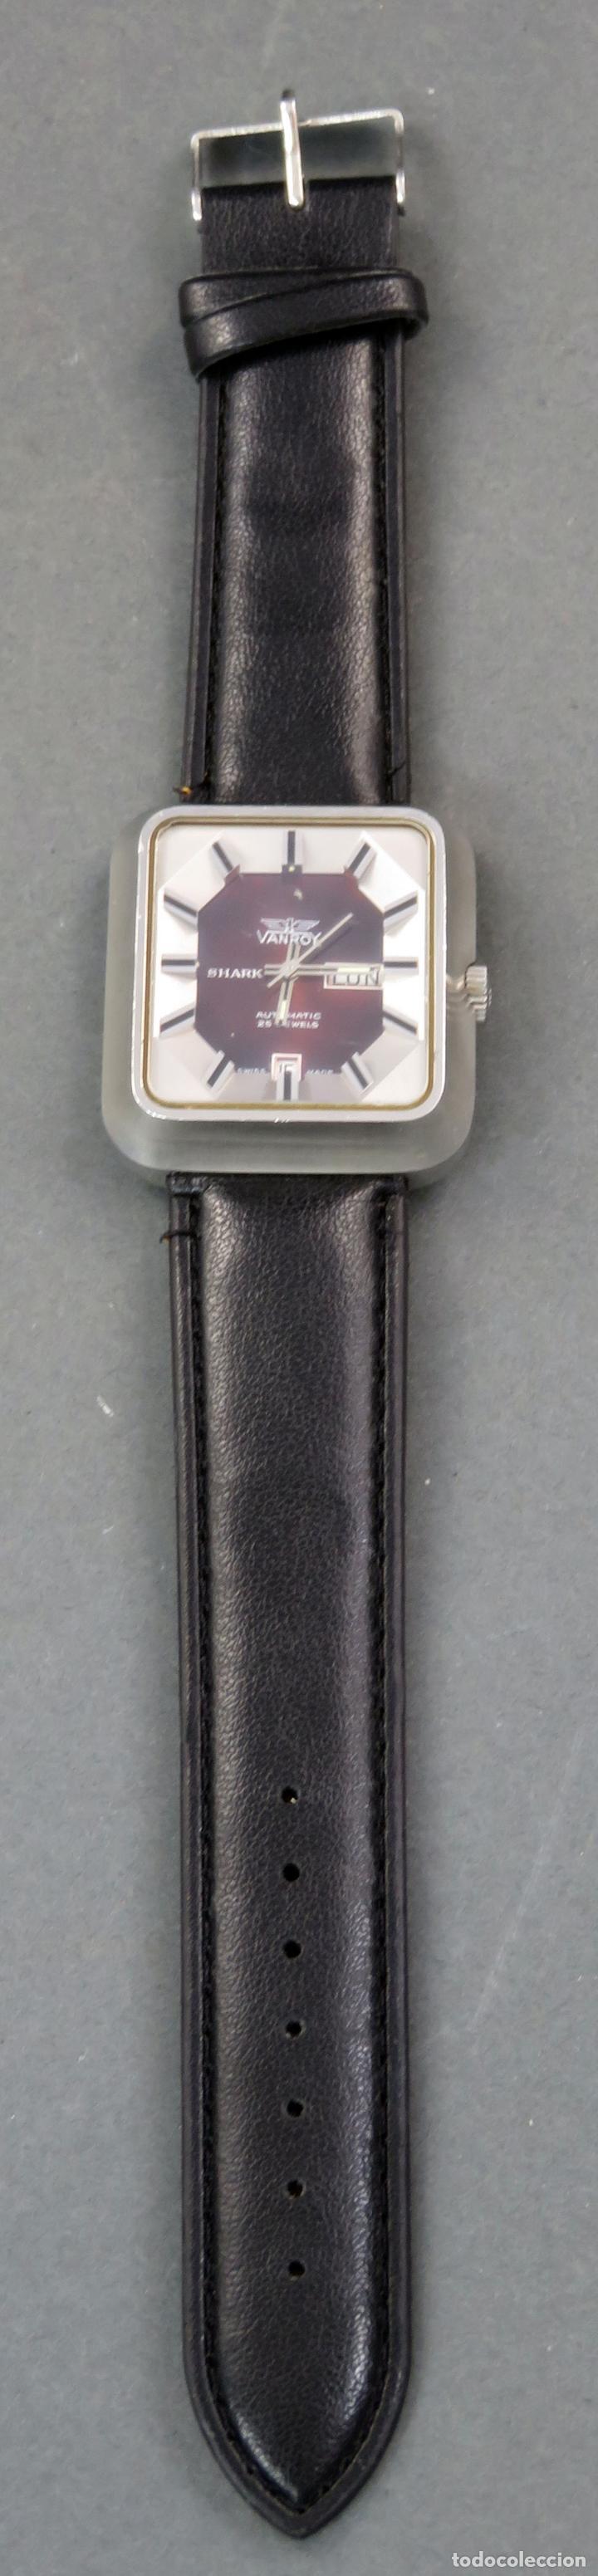 Relojes automáticos: Reloj automático Vanroy Automatic 25 jewels Shark Swiss Made Funciona - Foto 2 - 143164650